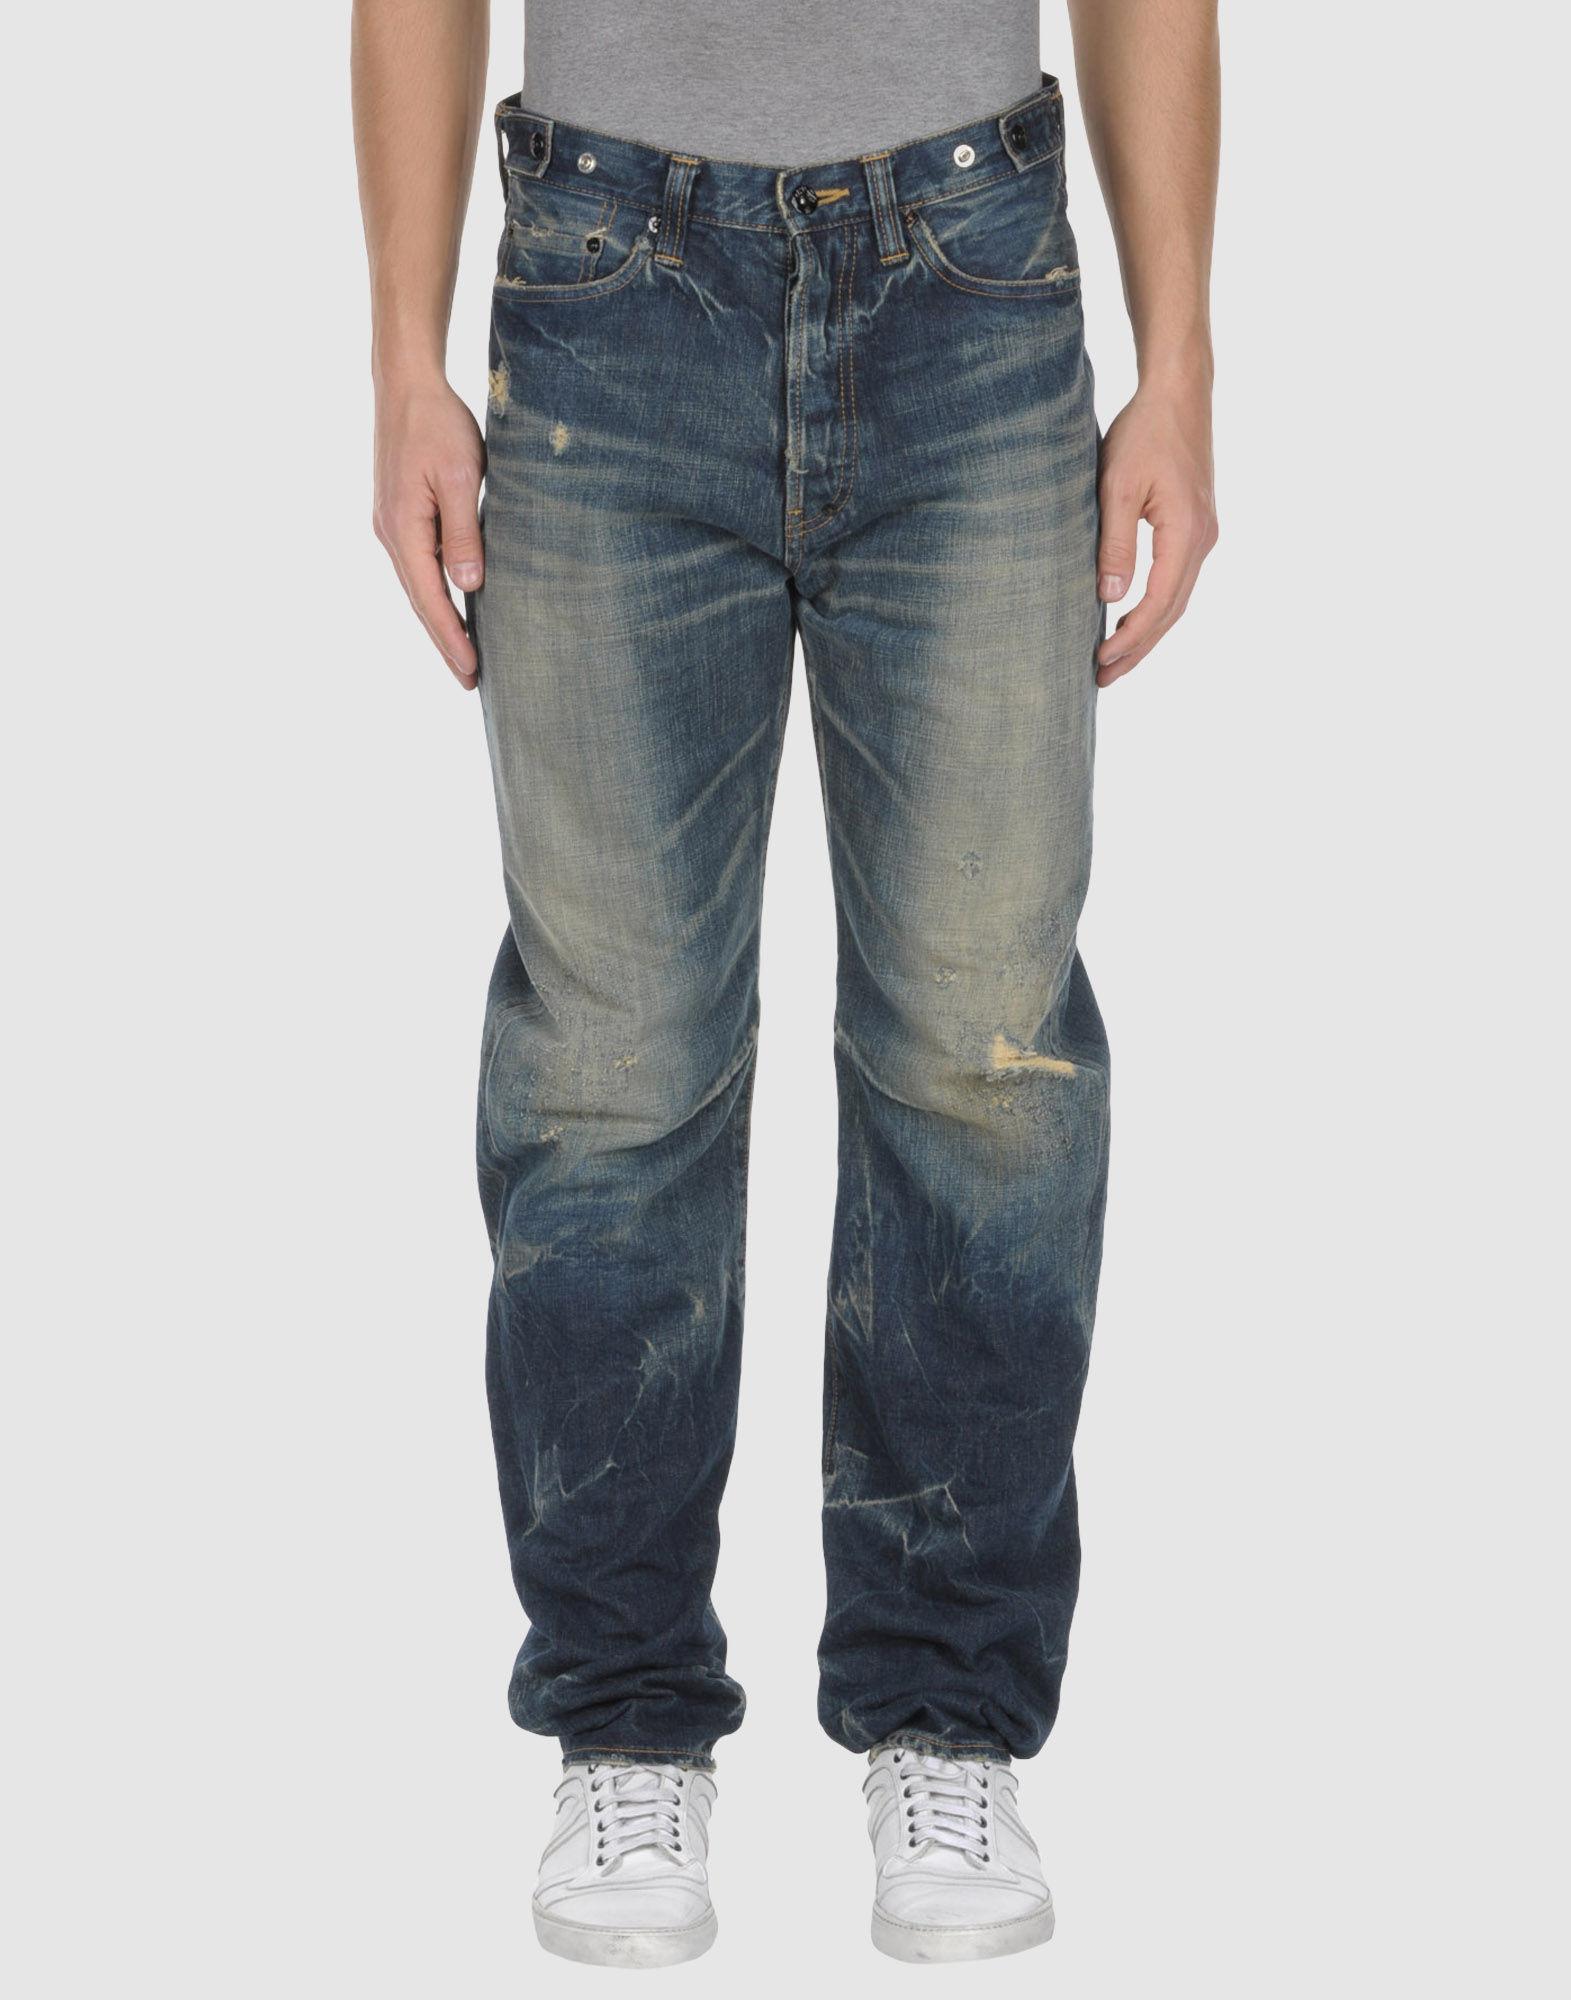 Pantaloni Jeans Prps Uomo - Acquista online su